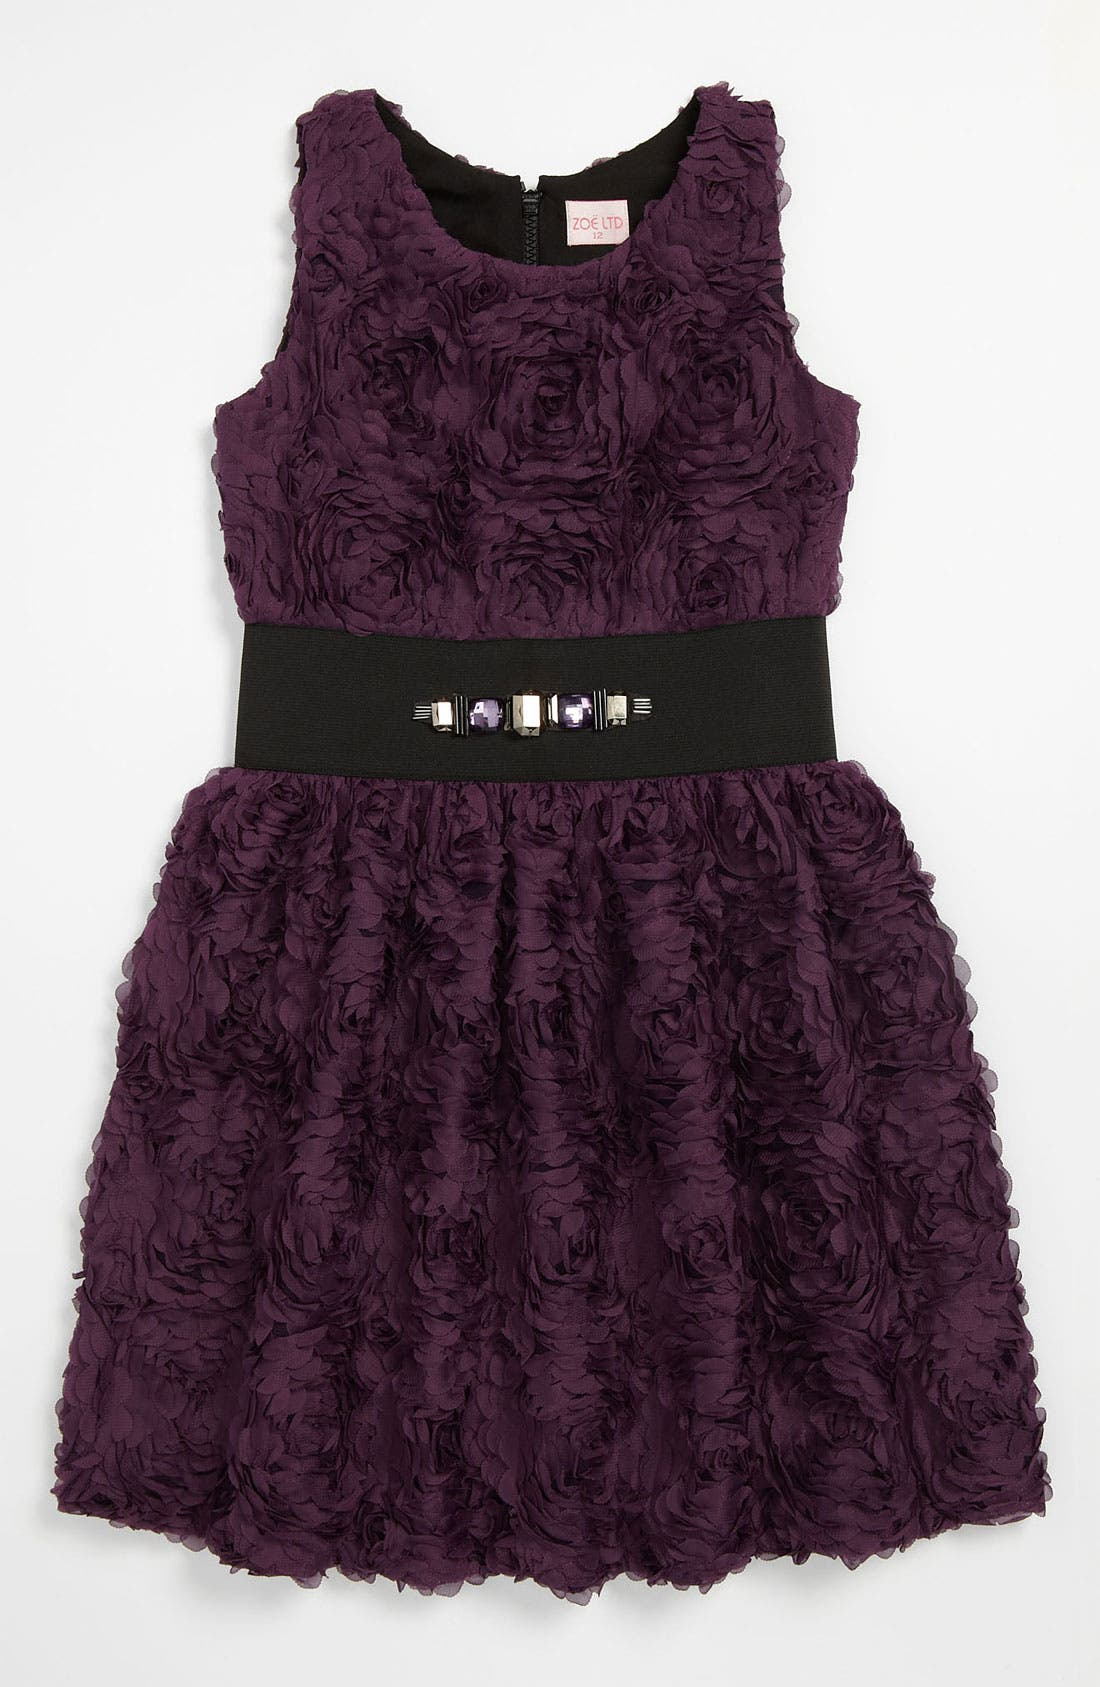 Alternate Image 1 Selected - Zoe Ltd 'Roses' Dress (Big Girls)